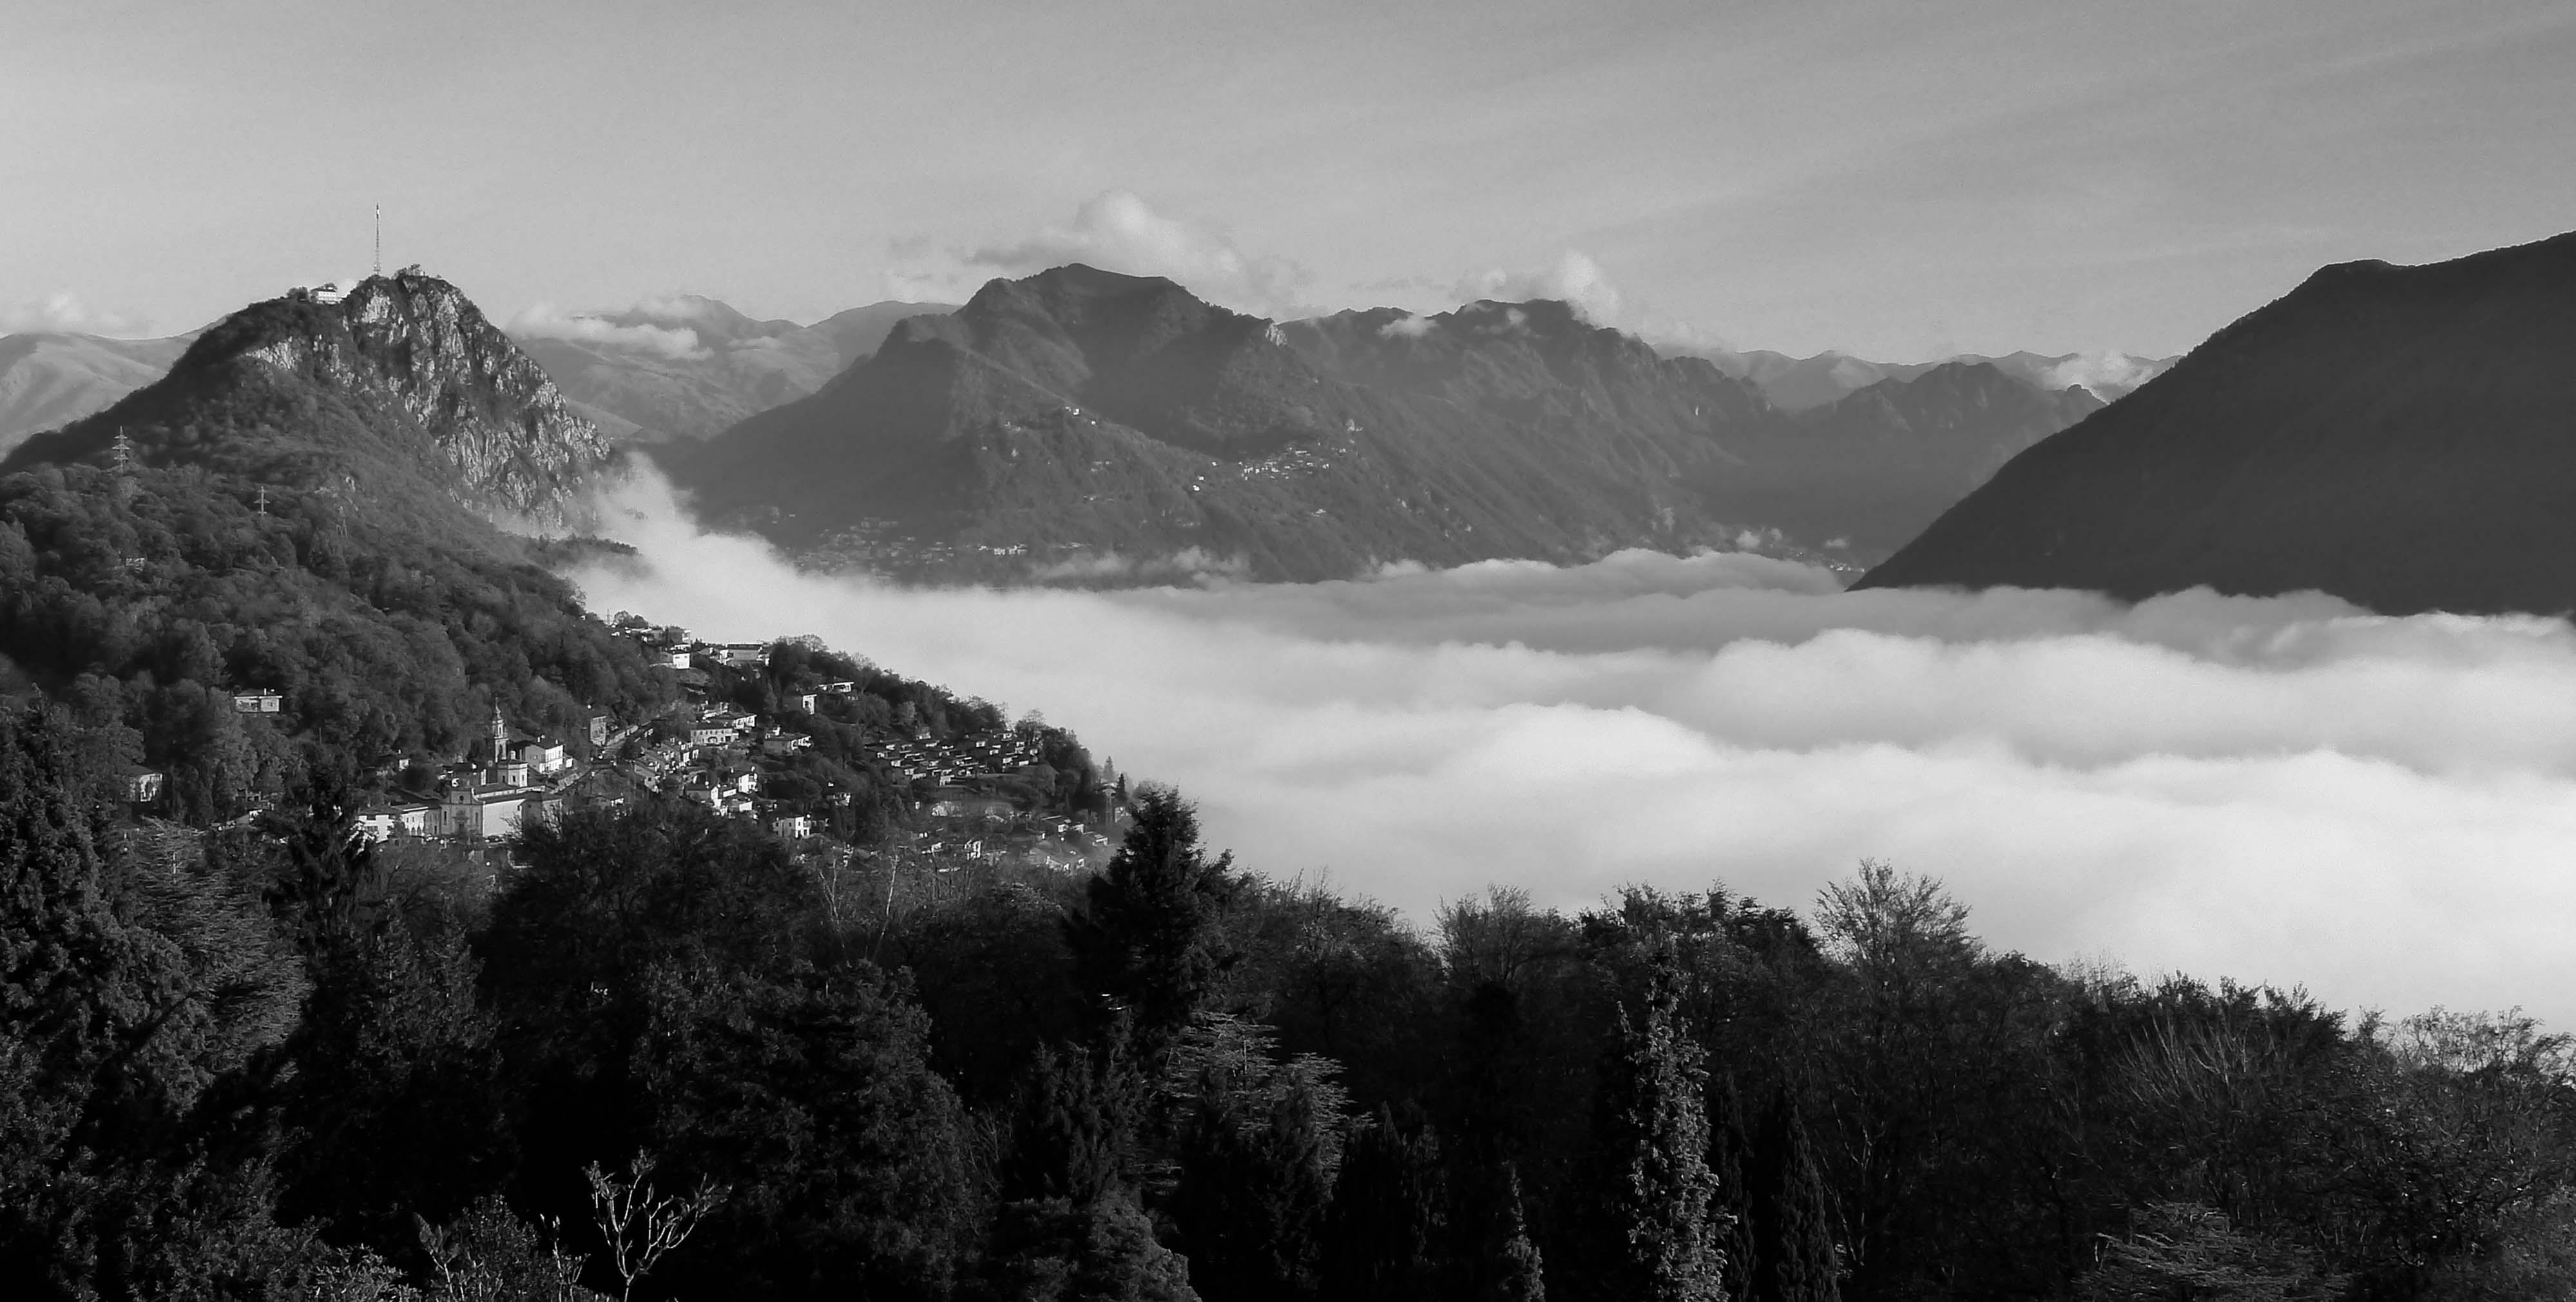 Carona nebbia 2.jpg